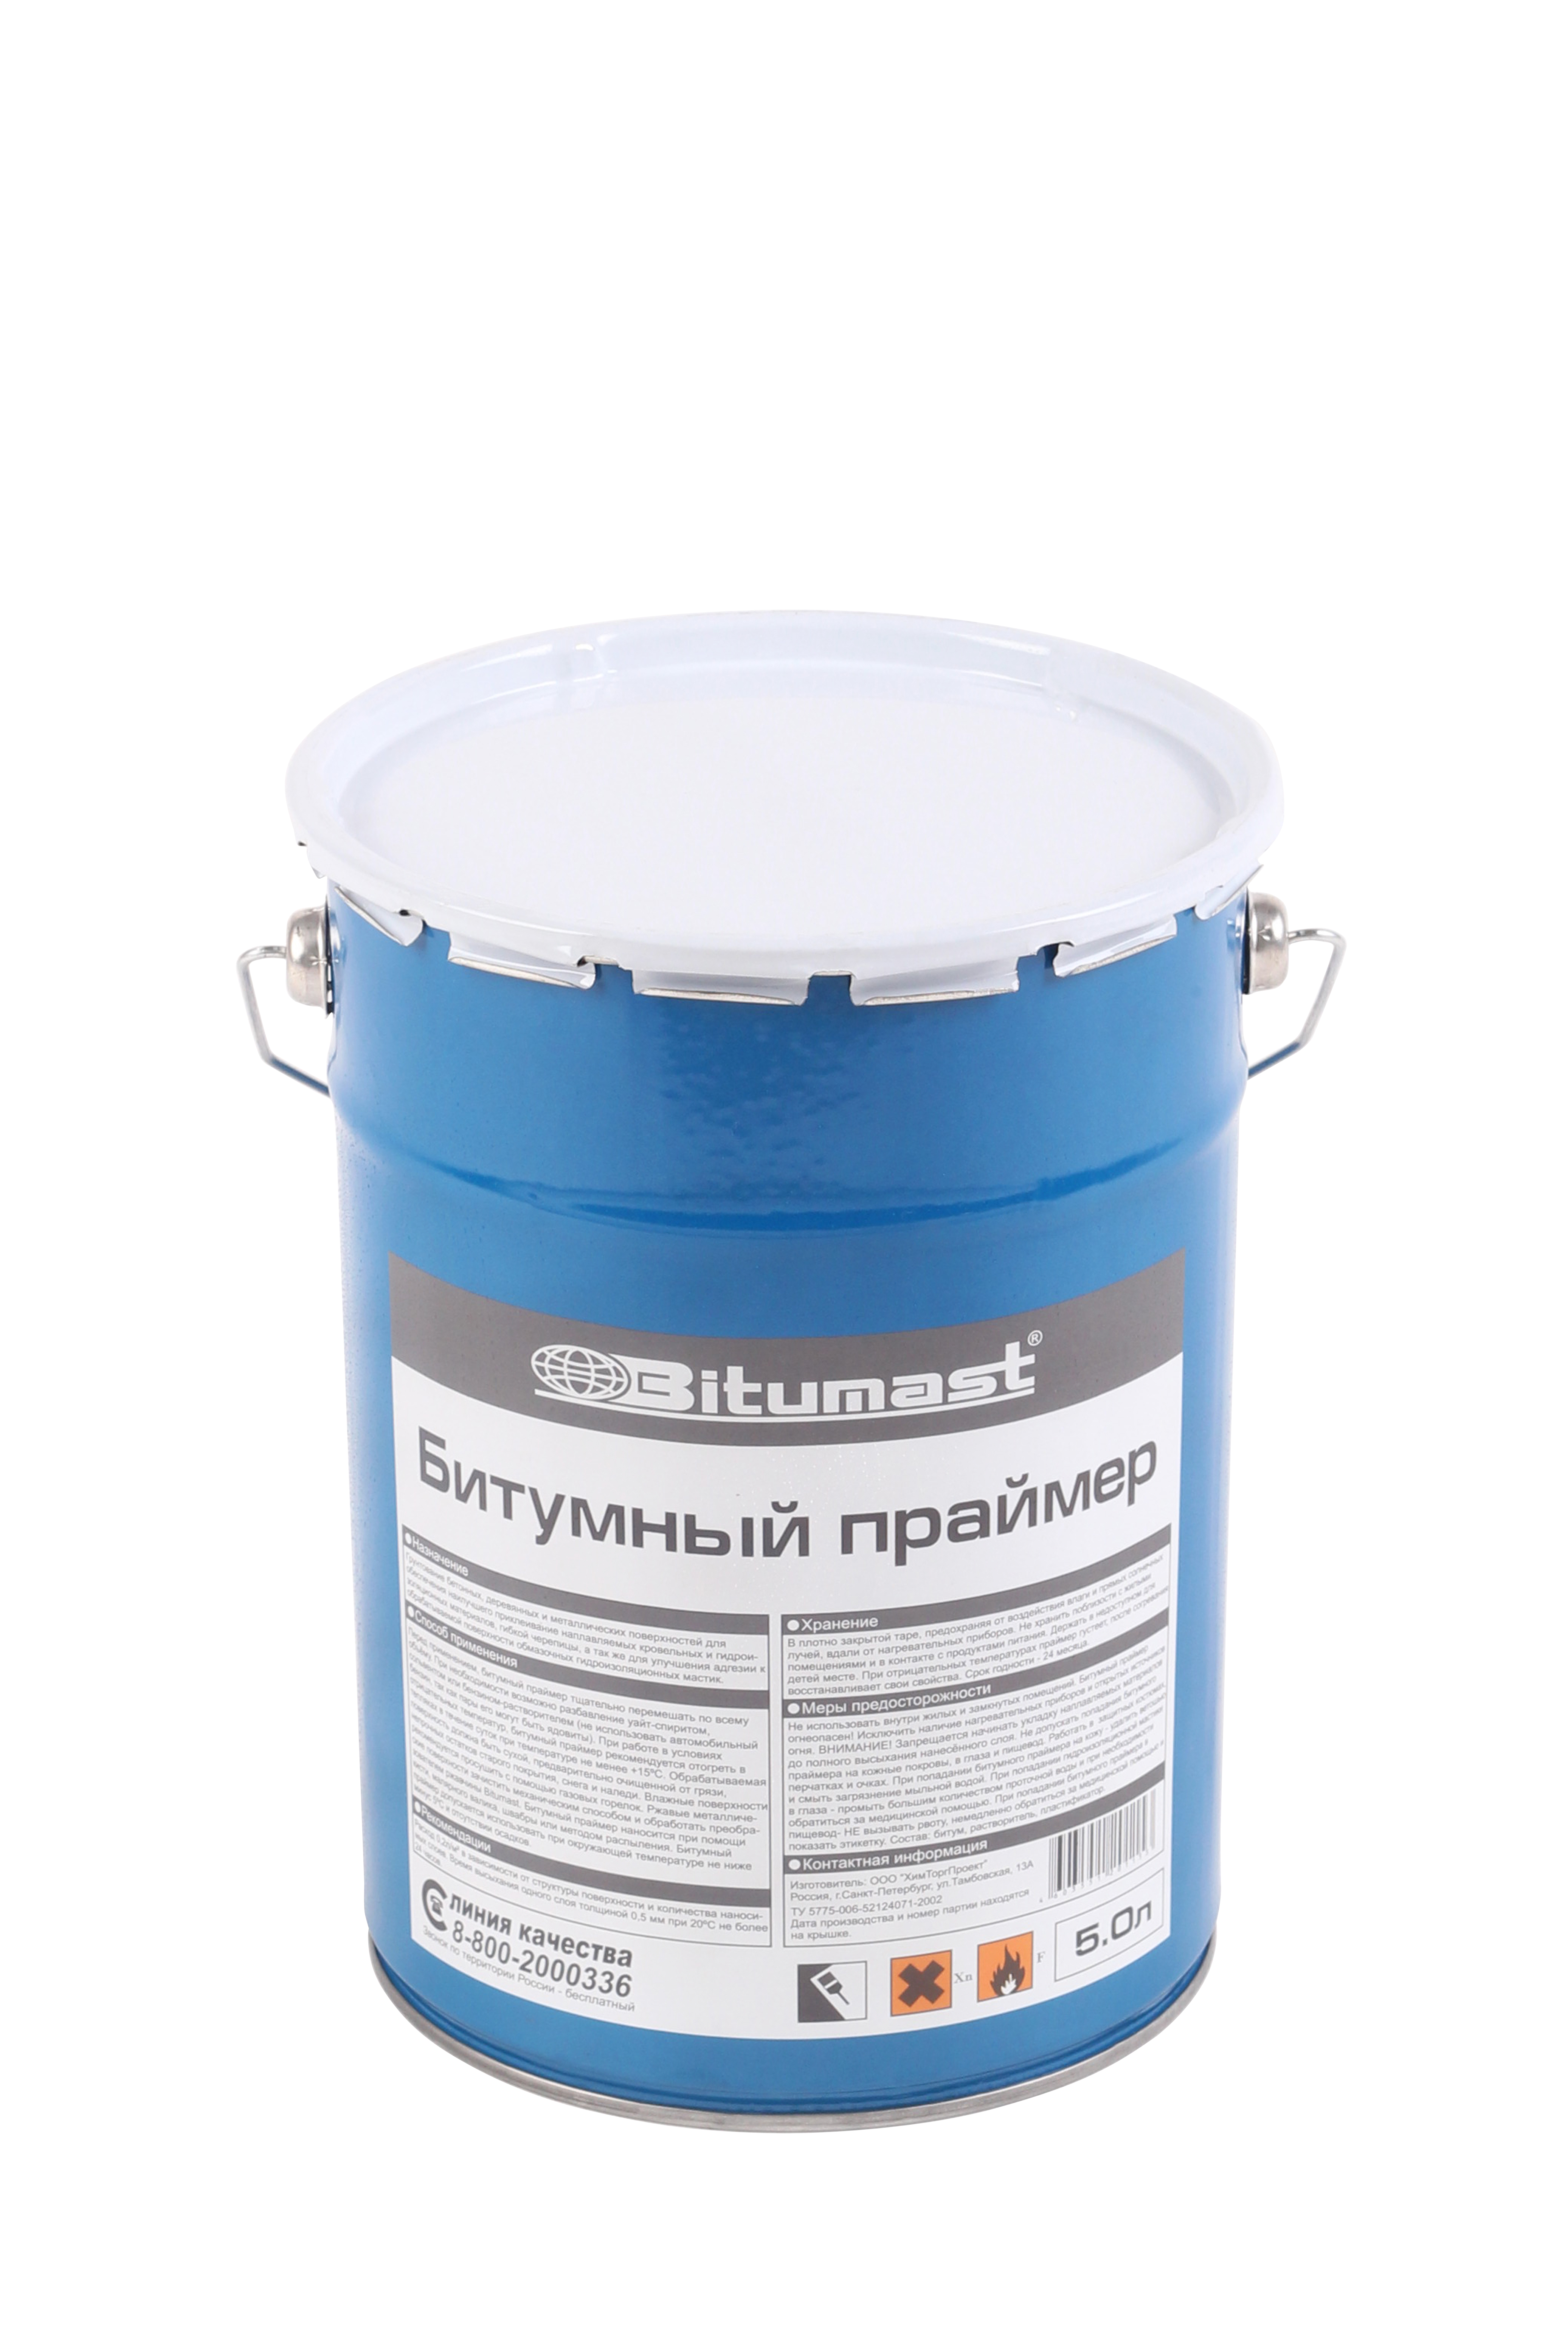 Праймер битумный Bitumast 4,5 кг/ 5 л